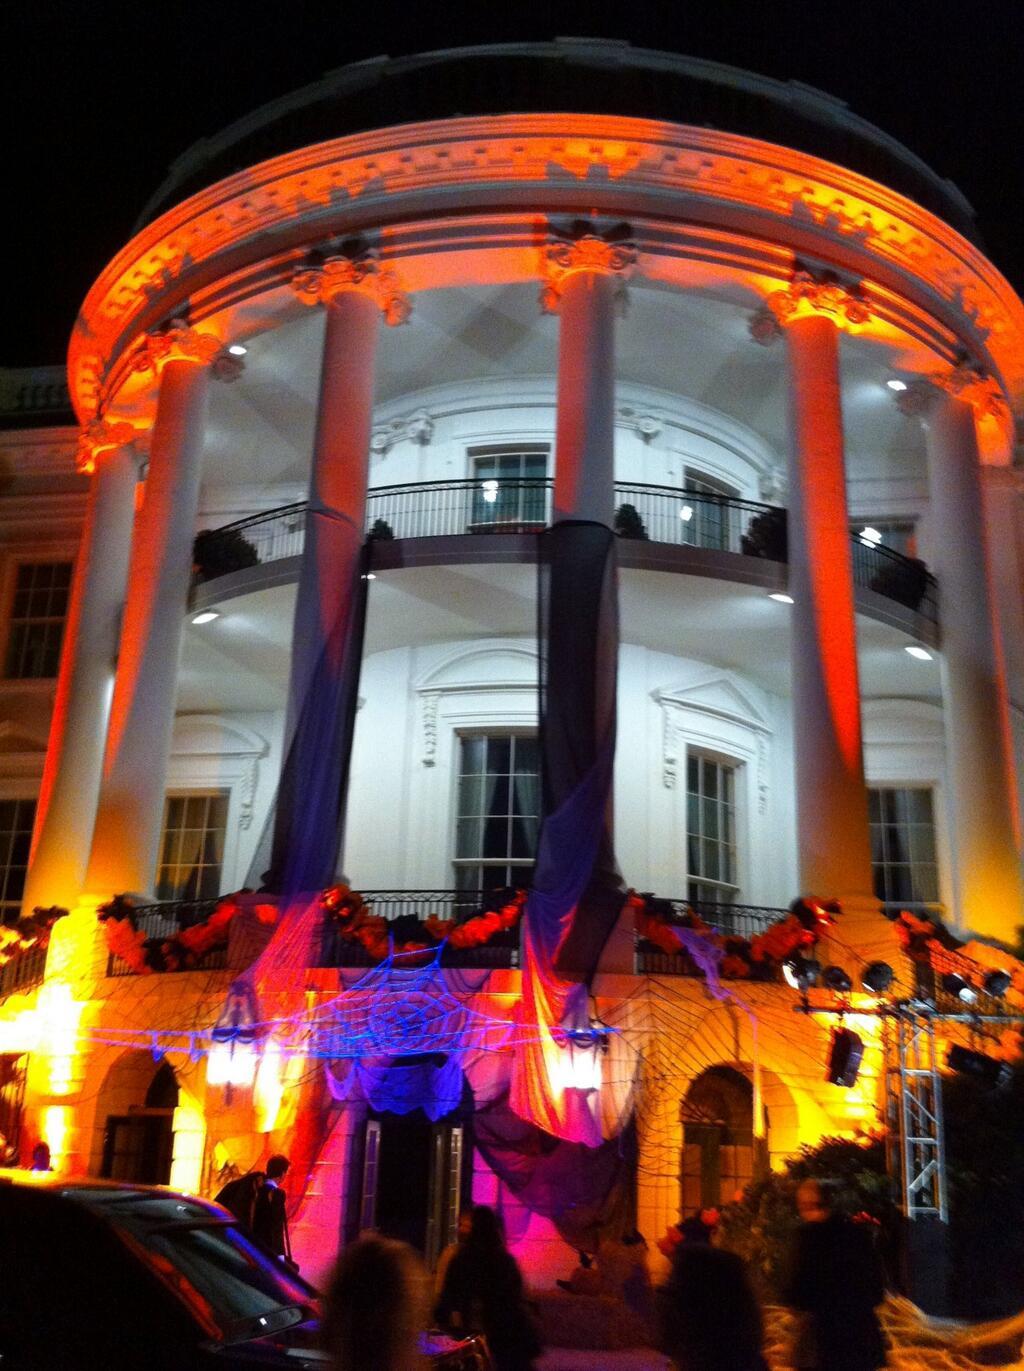 White House Decorated For Halloween Part - 20: White House Decorated For Halloween As POTUS Returned From Boston